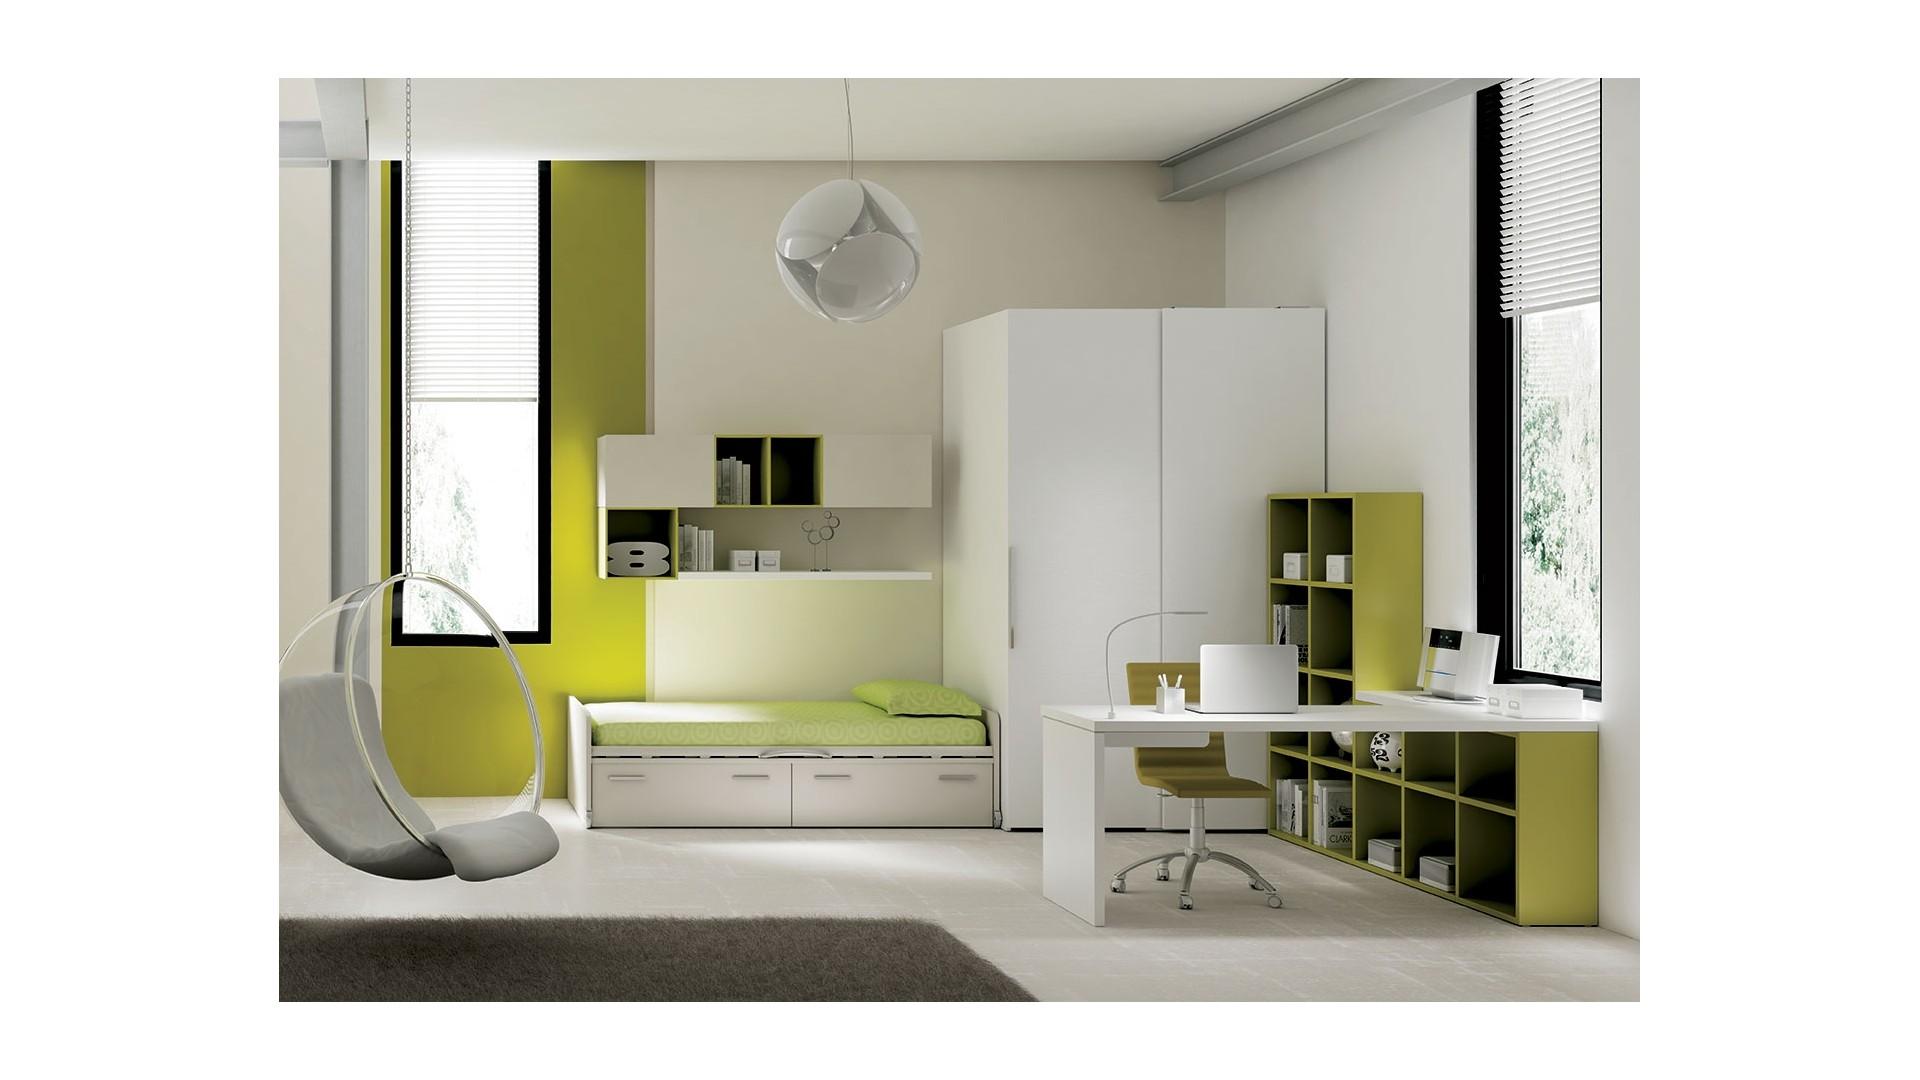 Chambre Ado Lit : Chambre ado avec lit rangement moretti compact so